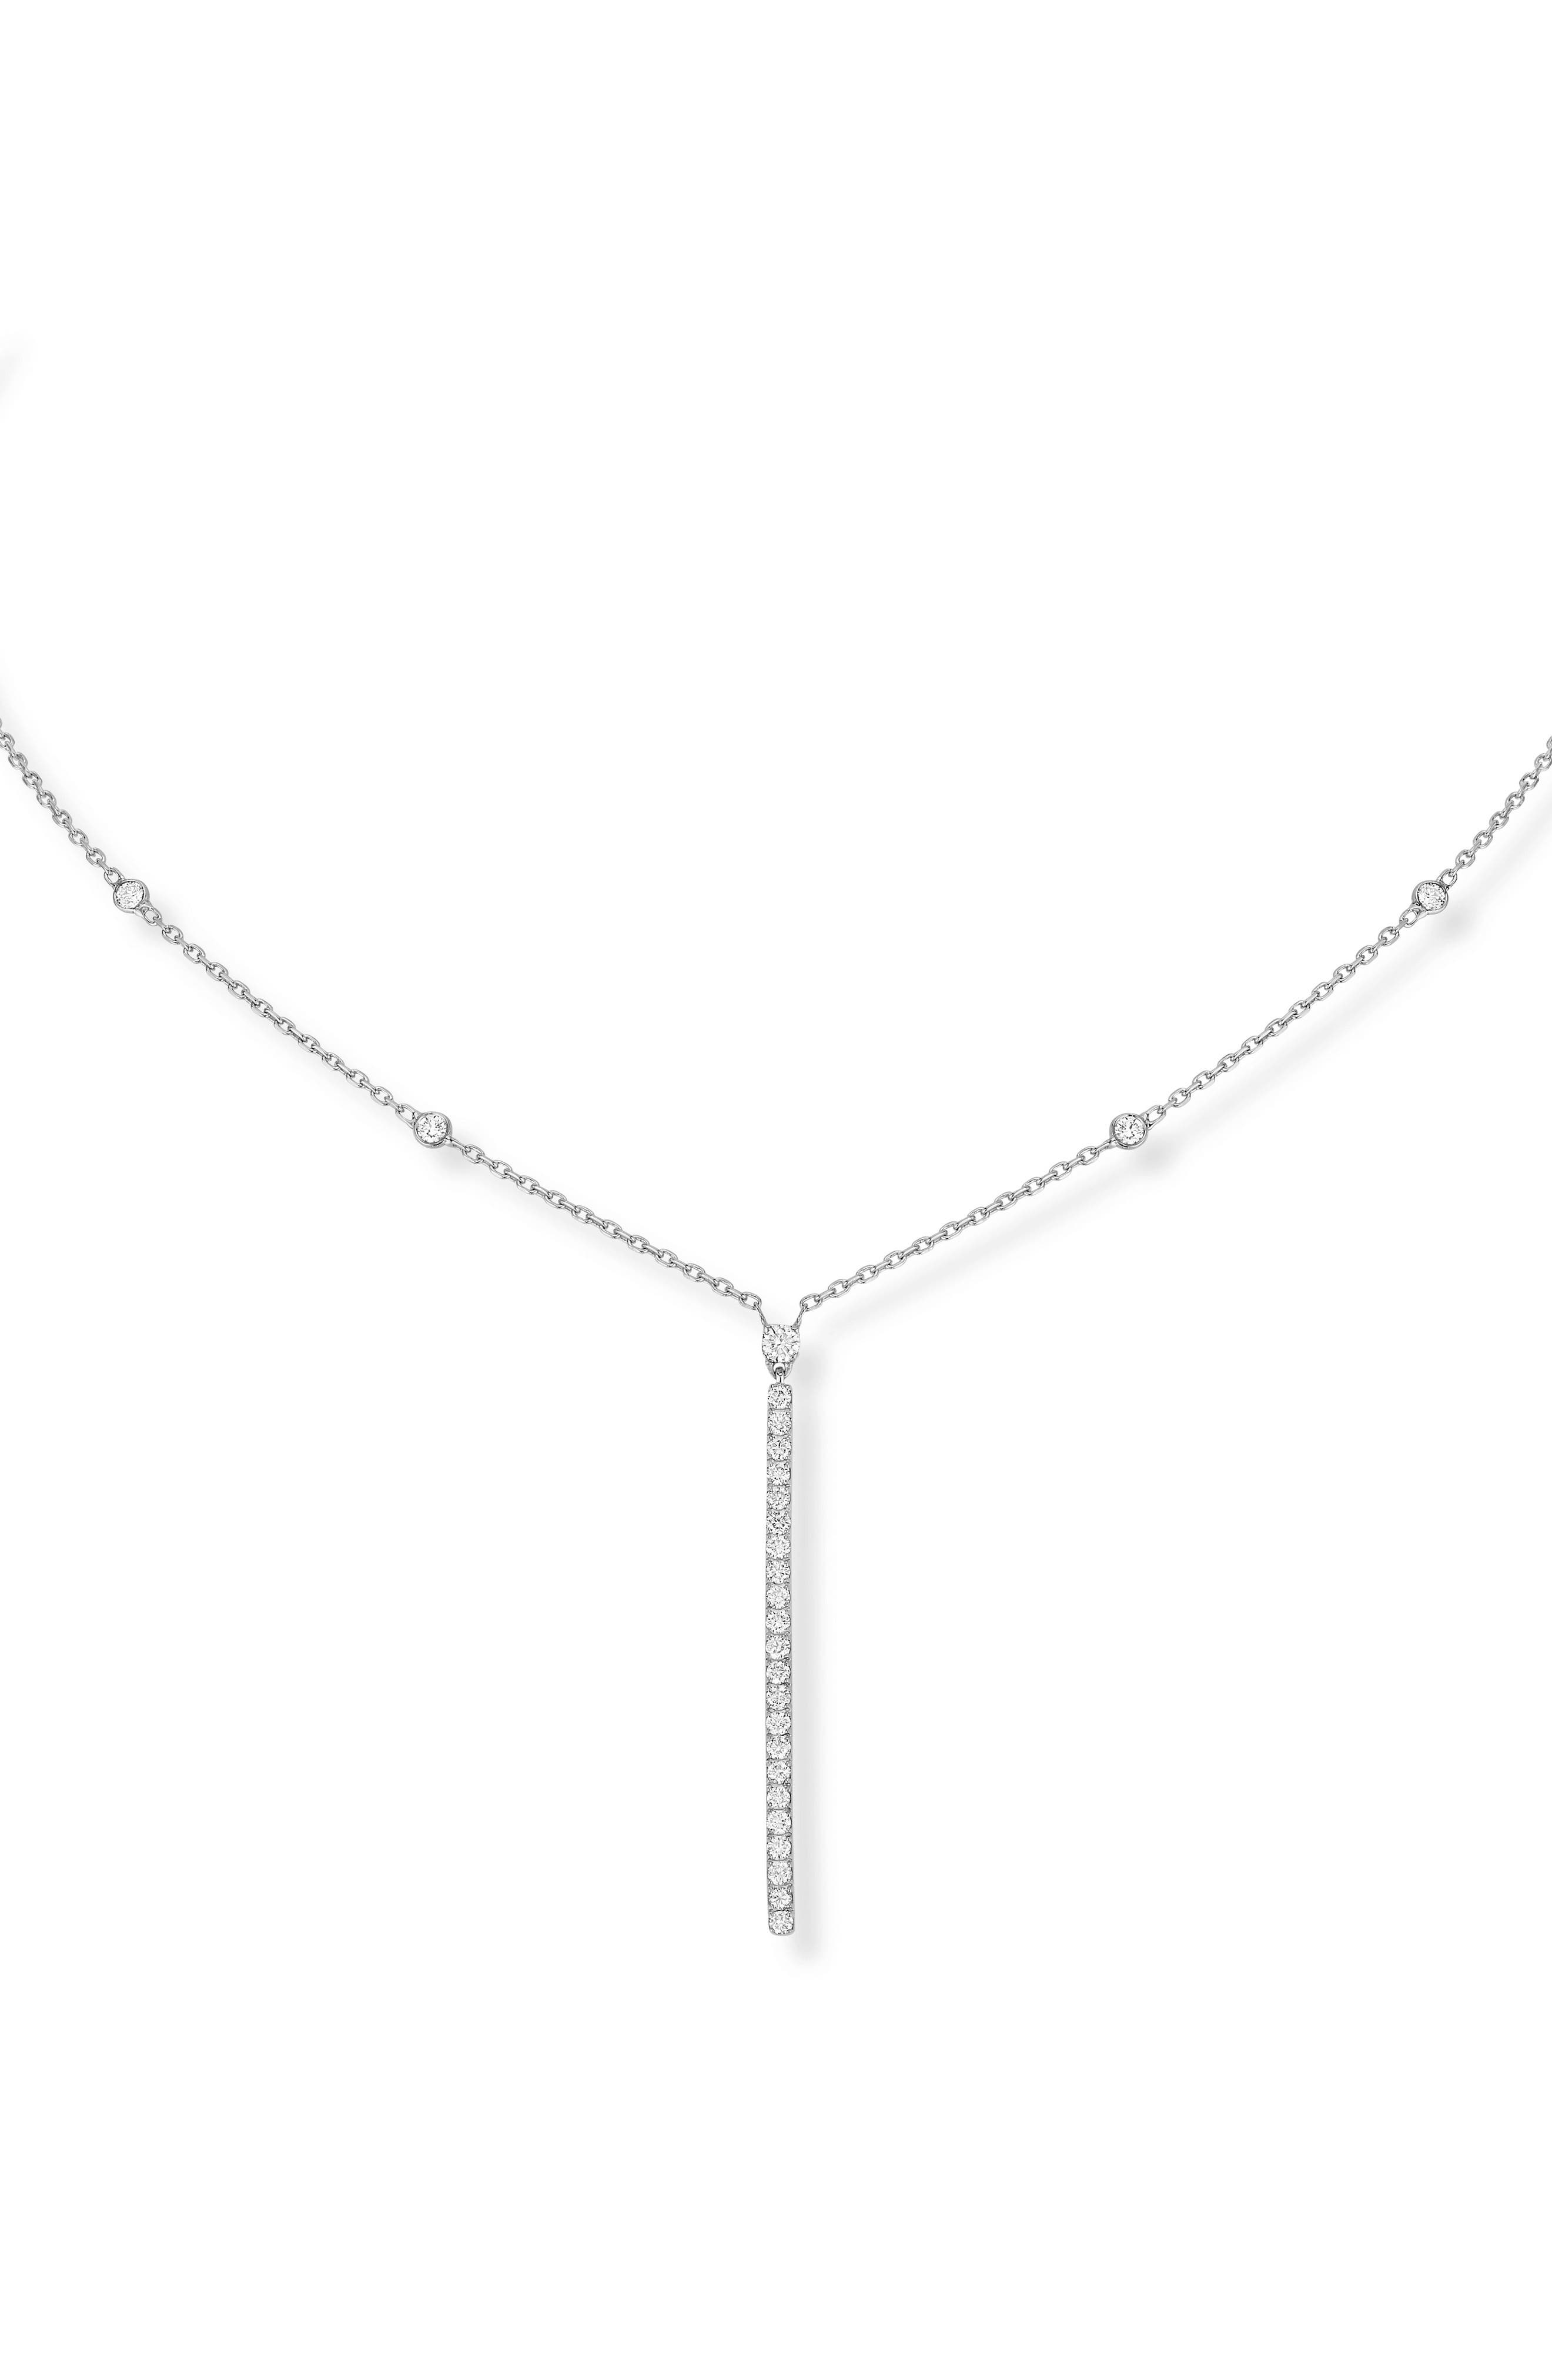 Main Image - Messika Gatsby Diamond Collar Necklace